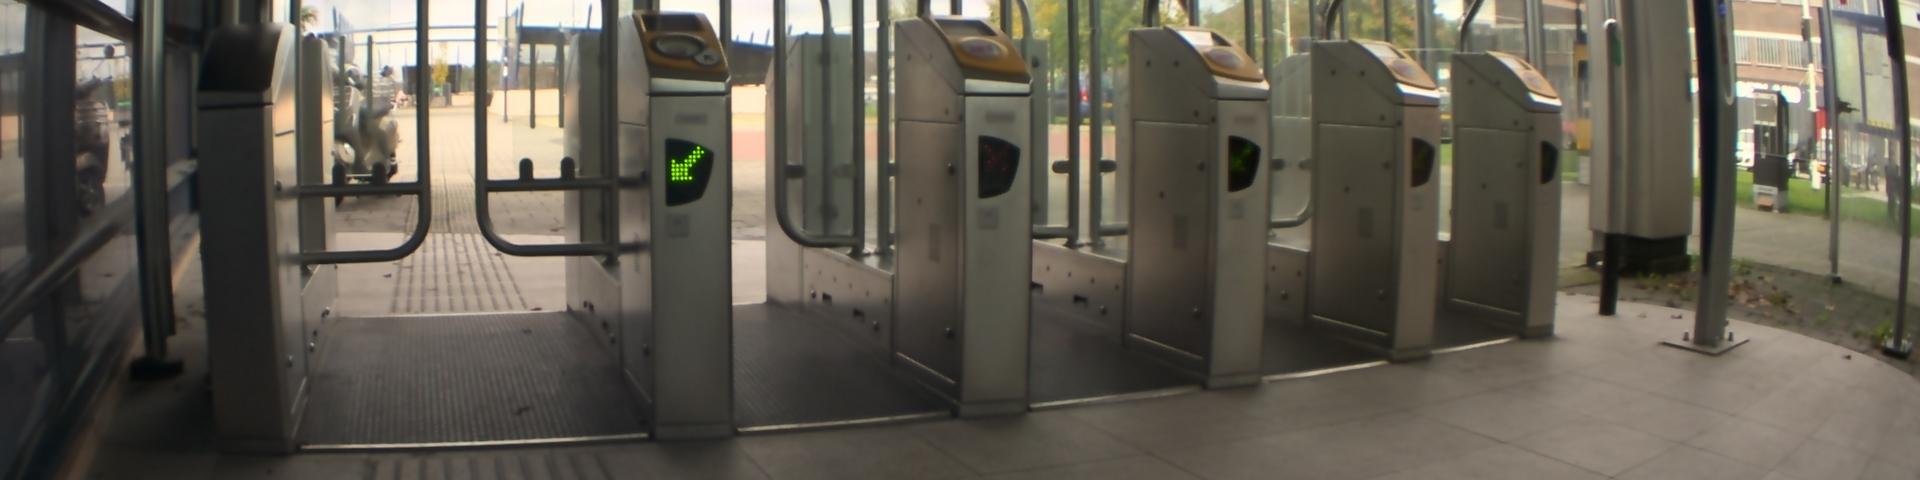 Doorgang bus station